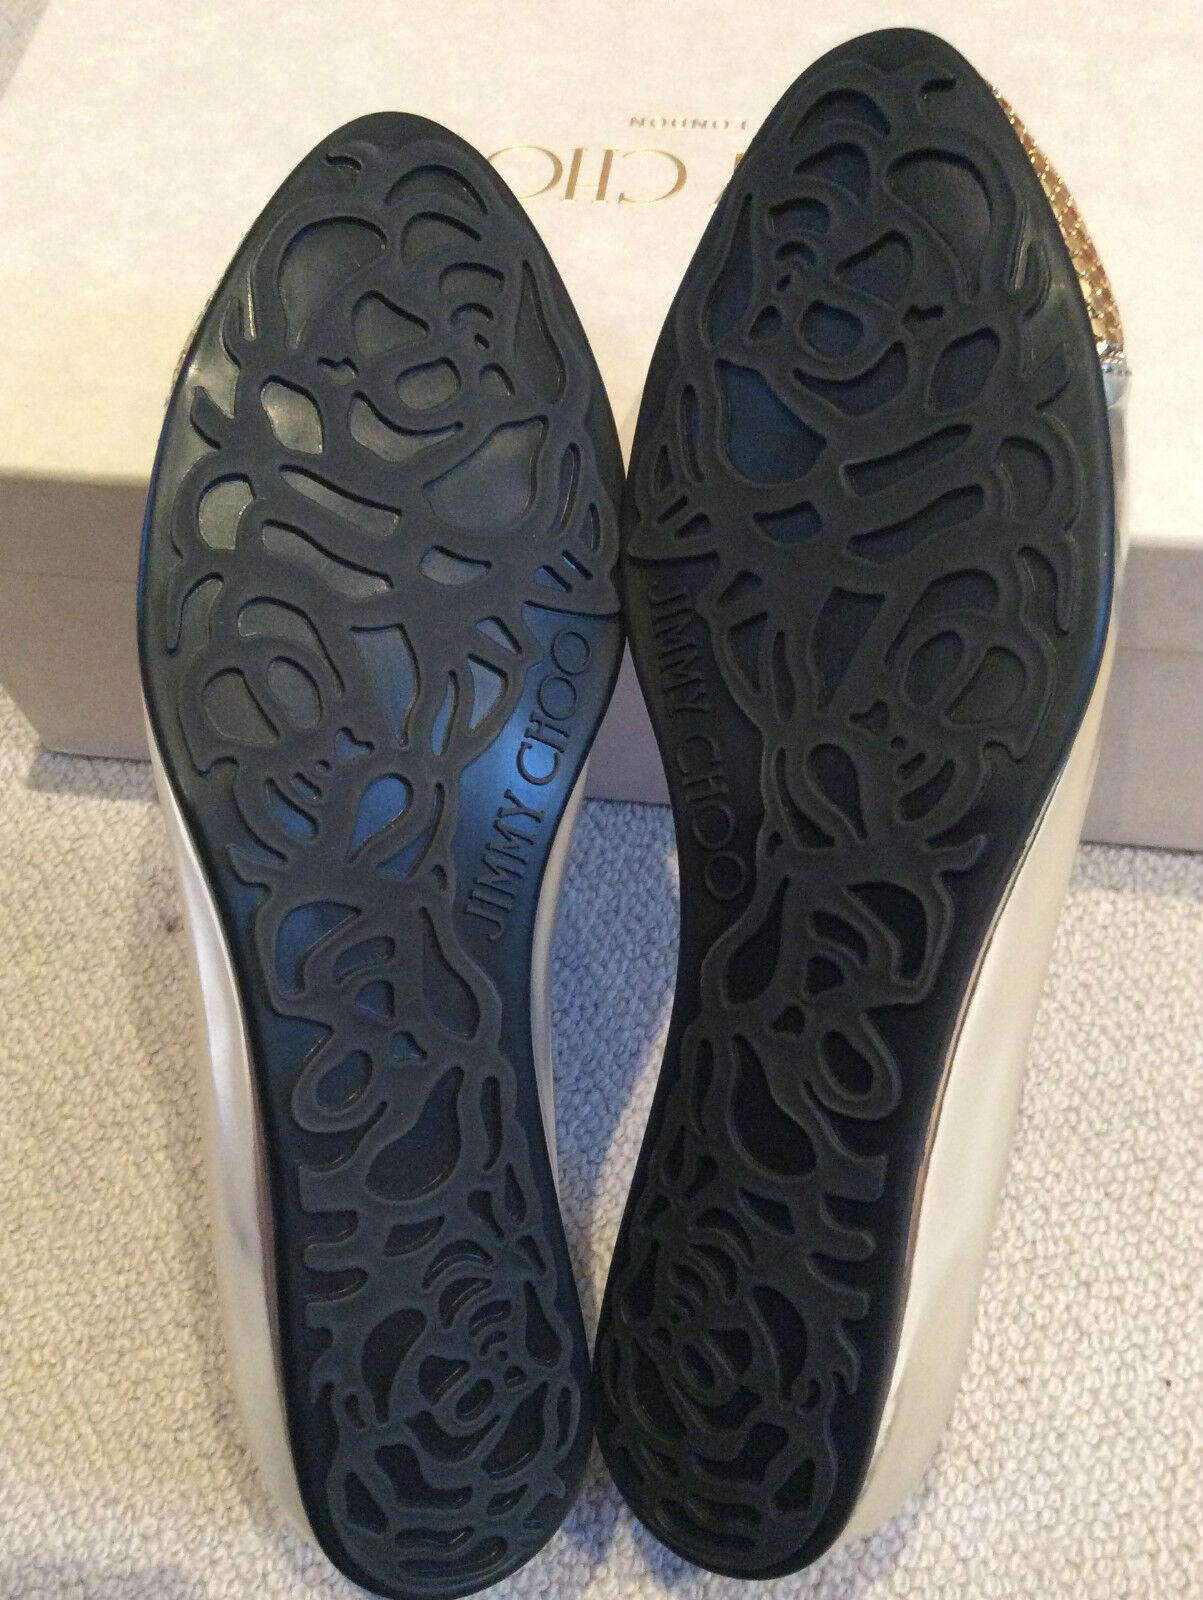 Jimmy choo choo choo  waine  en cuir argenté ornée de luxe ballerine flat 36 0472ea